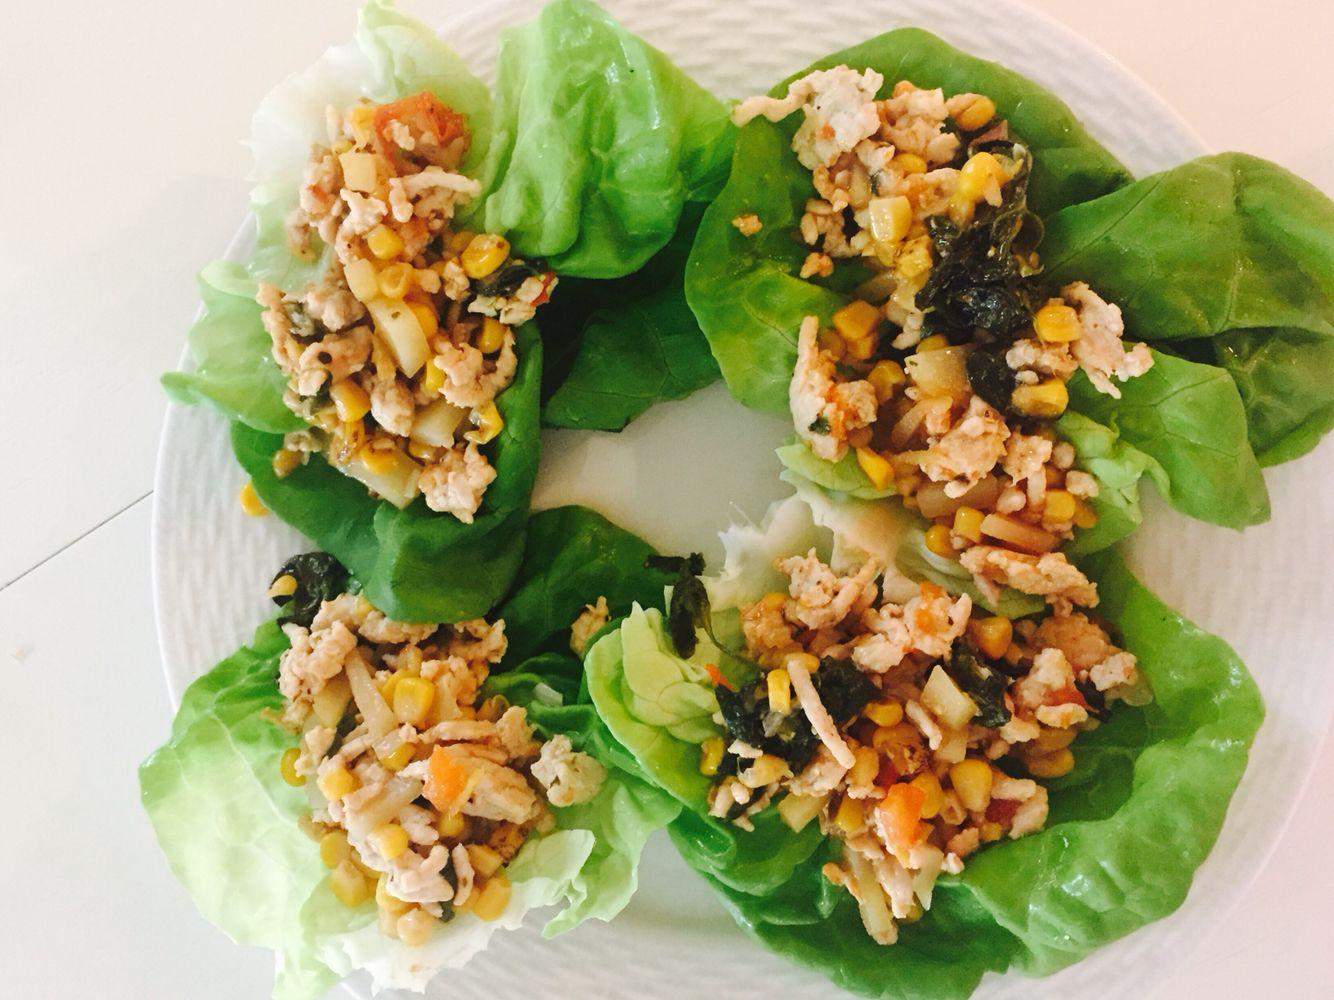 Turkey and corn lettuce wraps